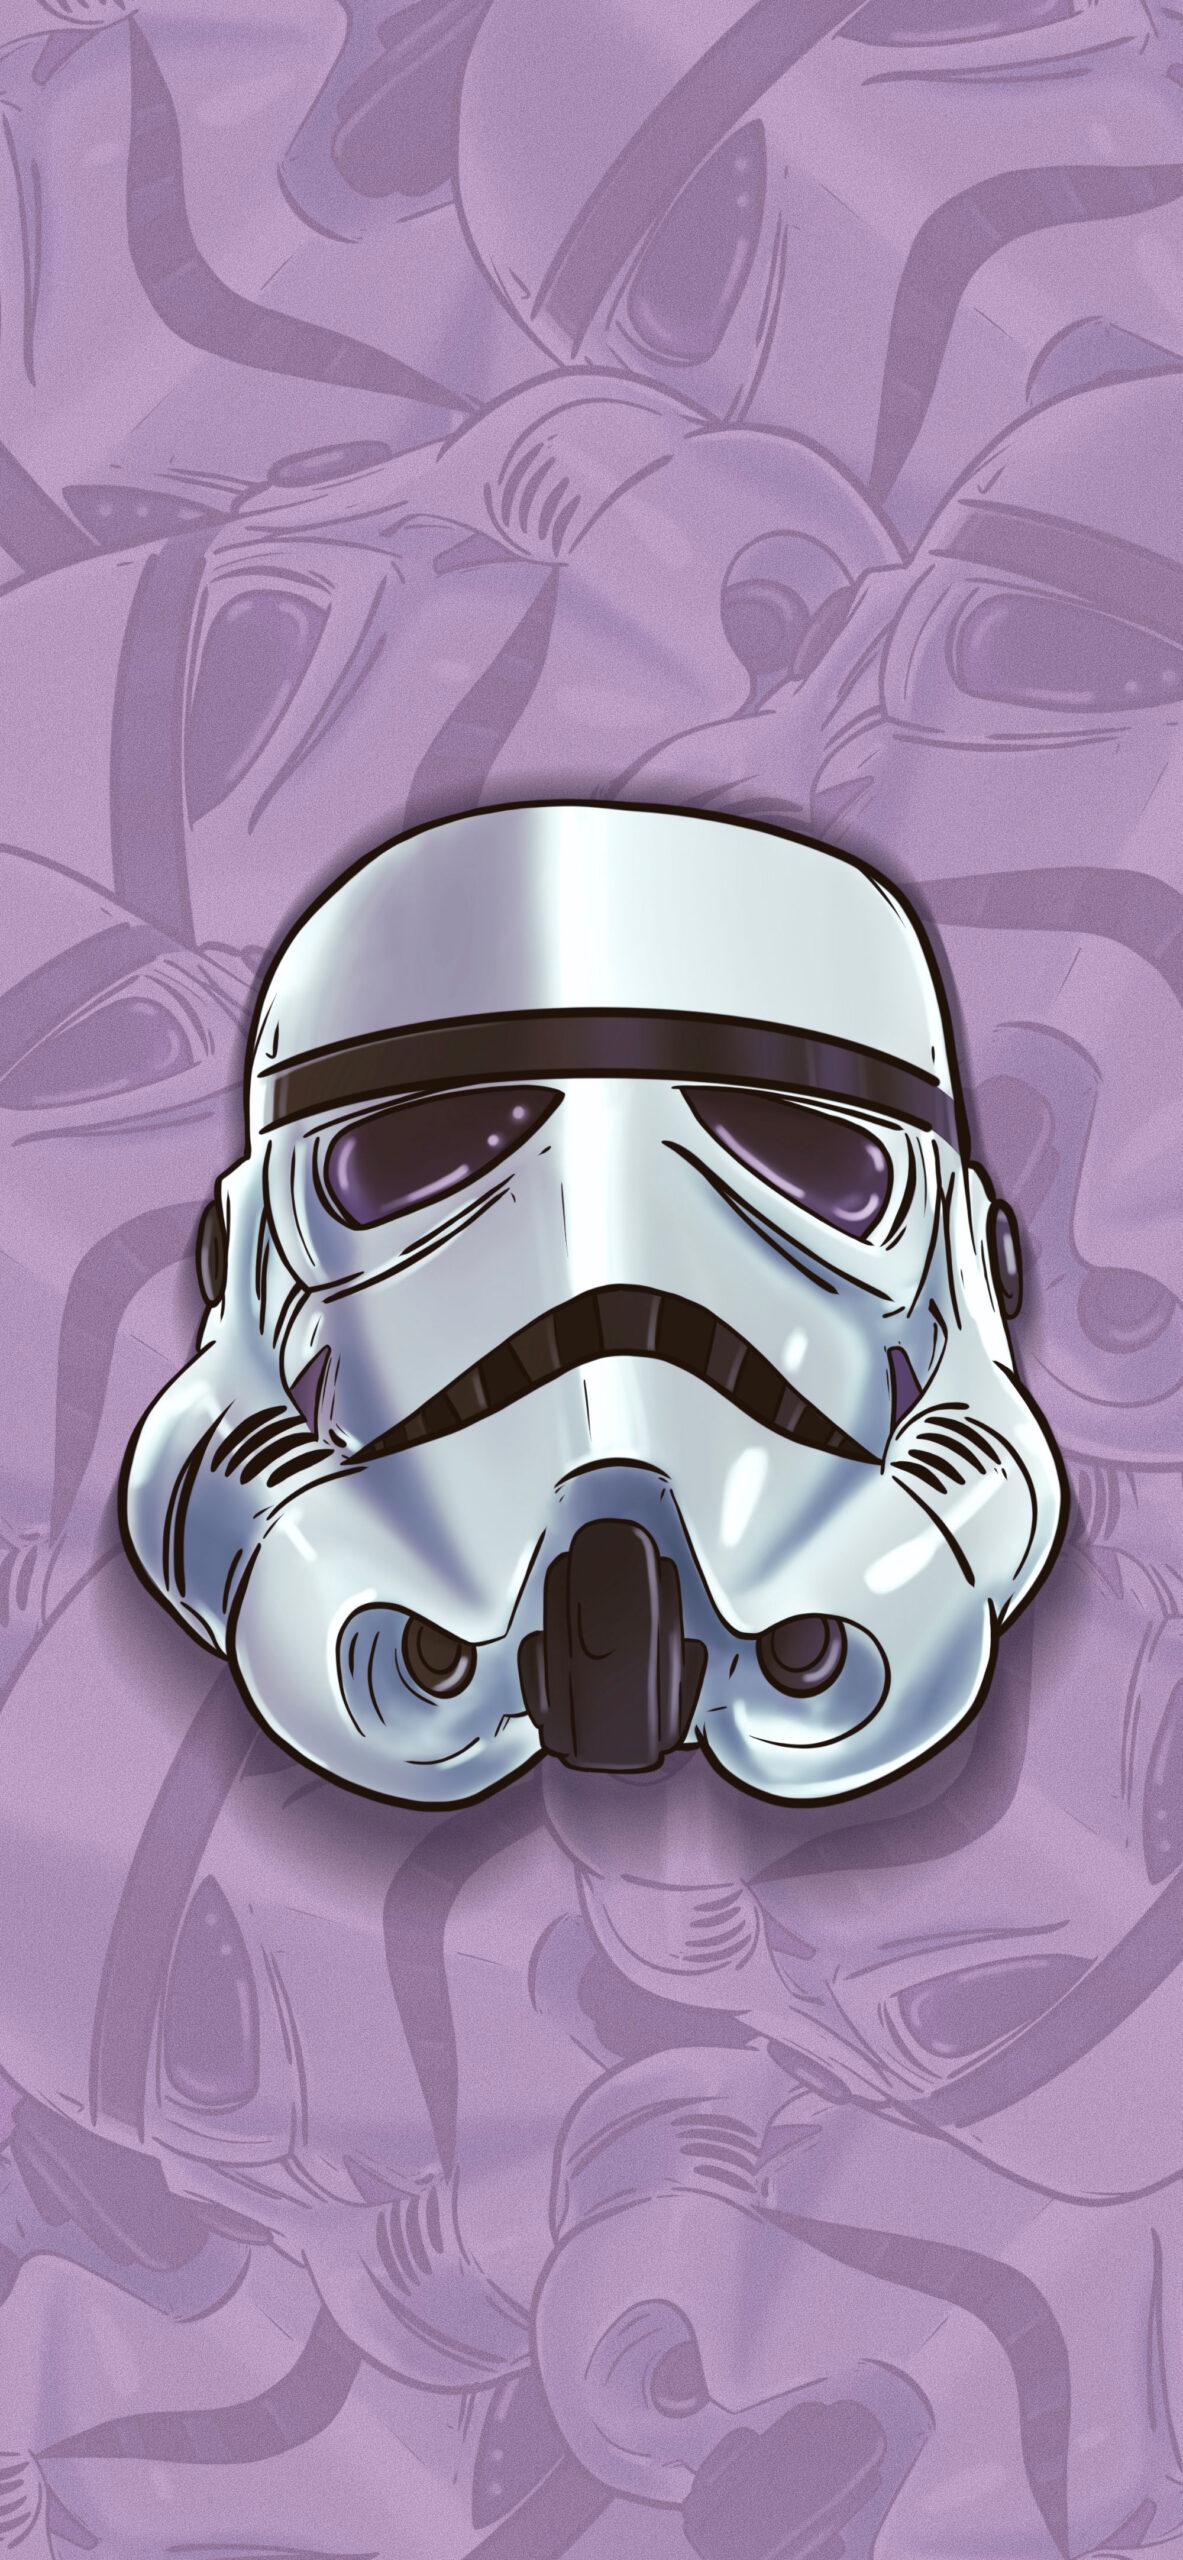 star wars stormtrooper helmet purple wallpaper